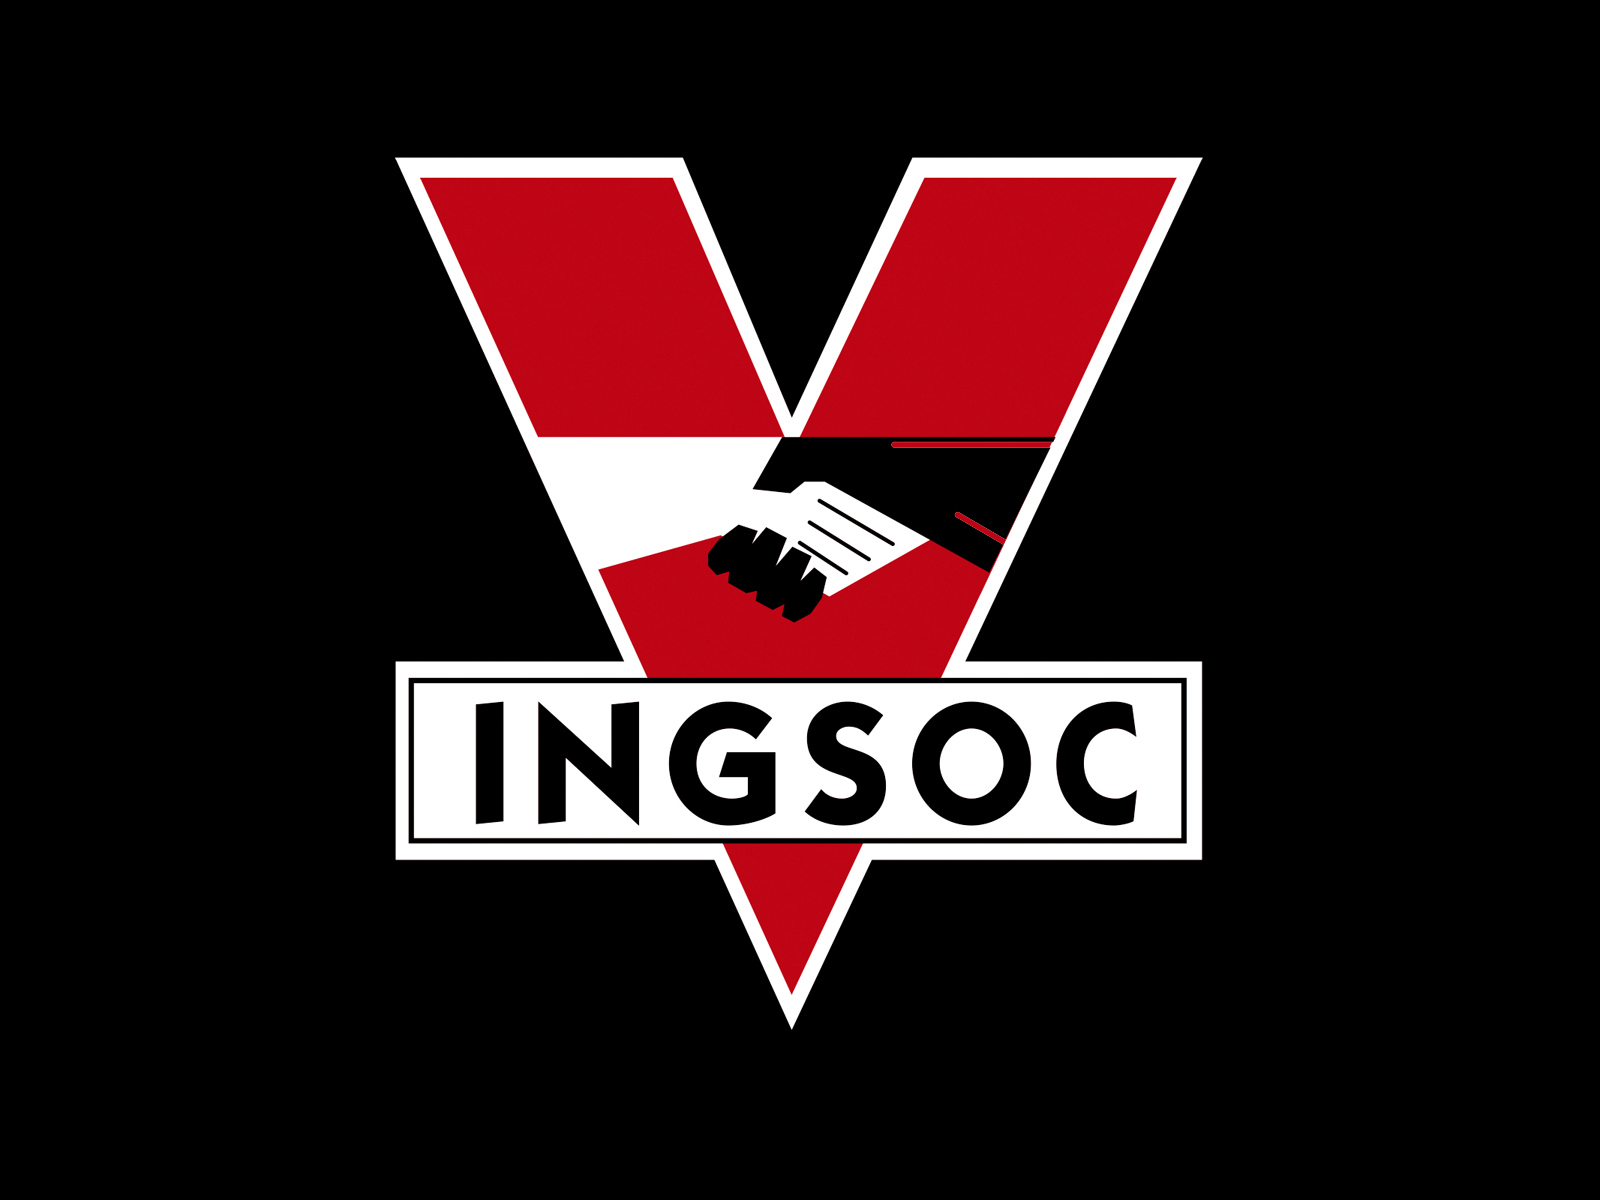 INGSOC by ghigo1972